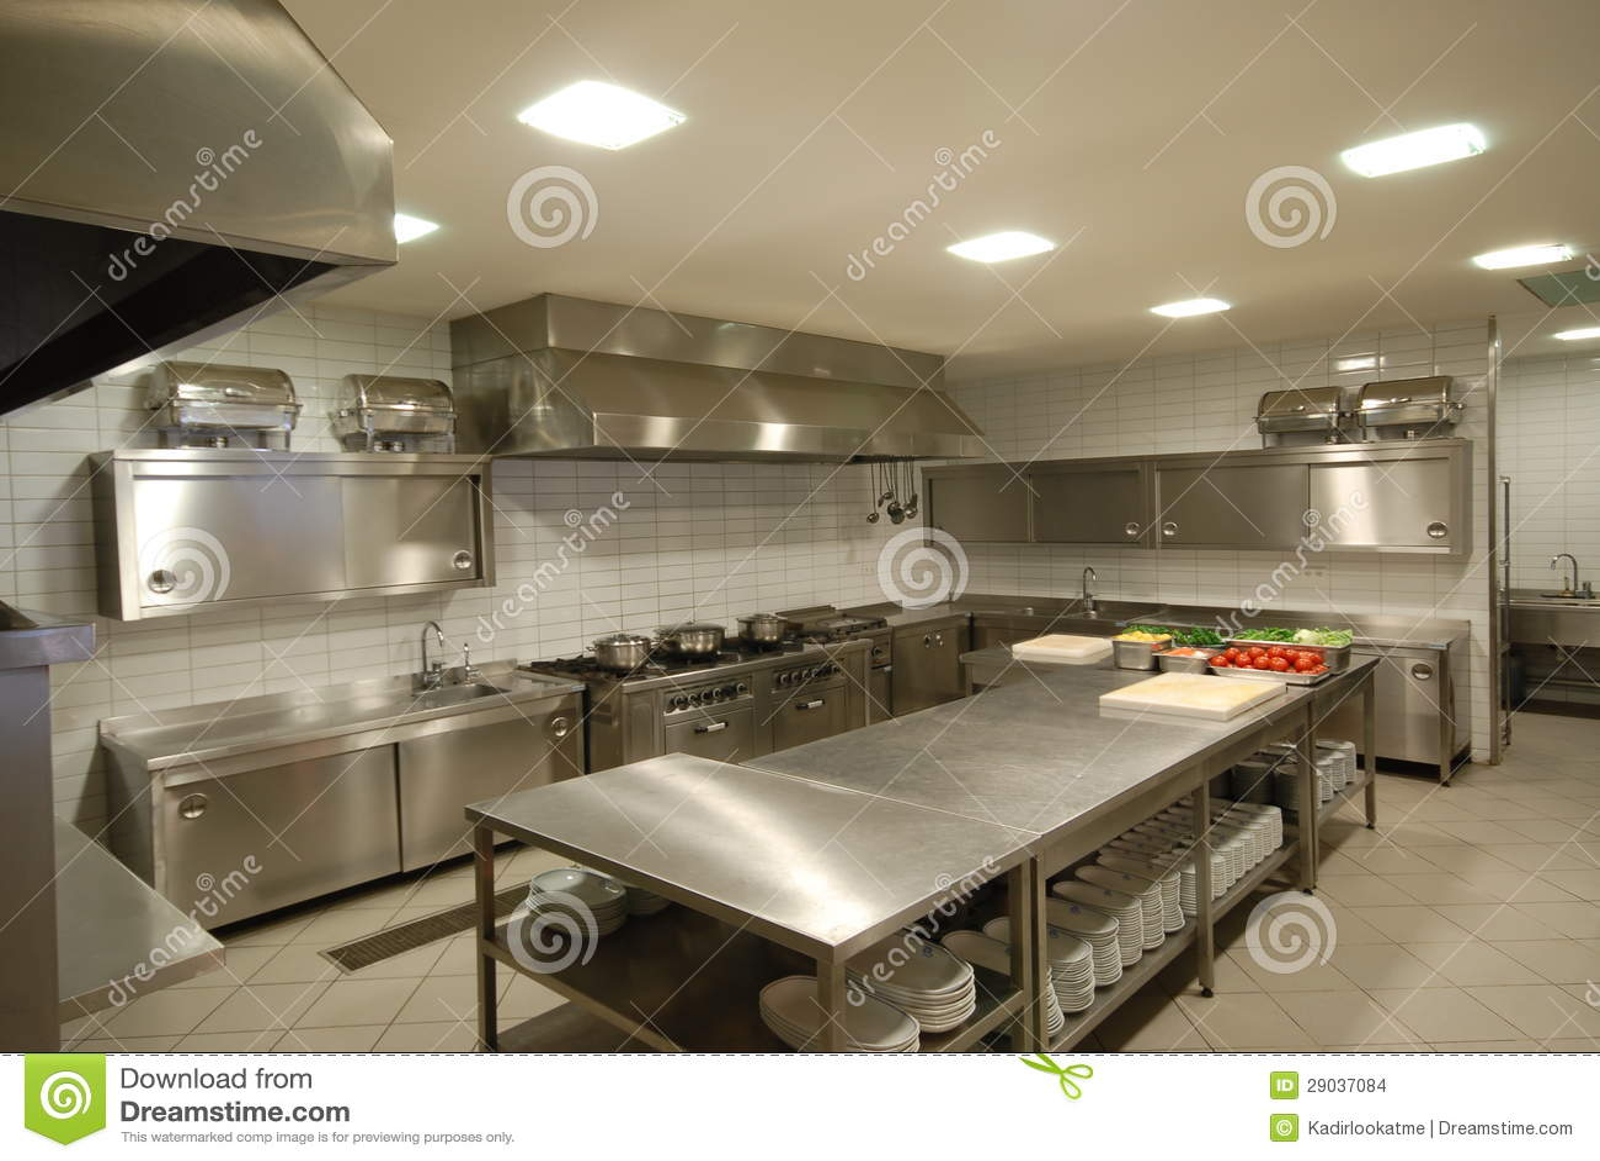 Cuisine moderne dans le restaurant images stock image for Cuisine professionnelle restaurant